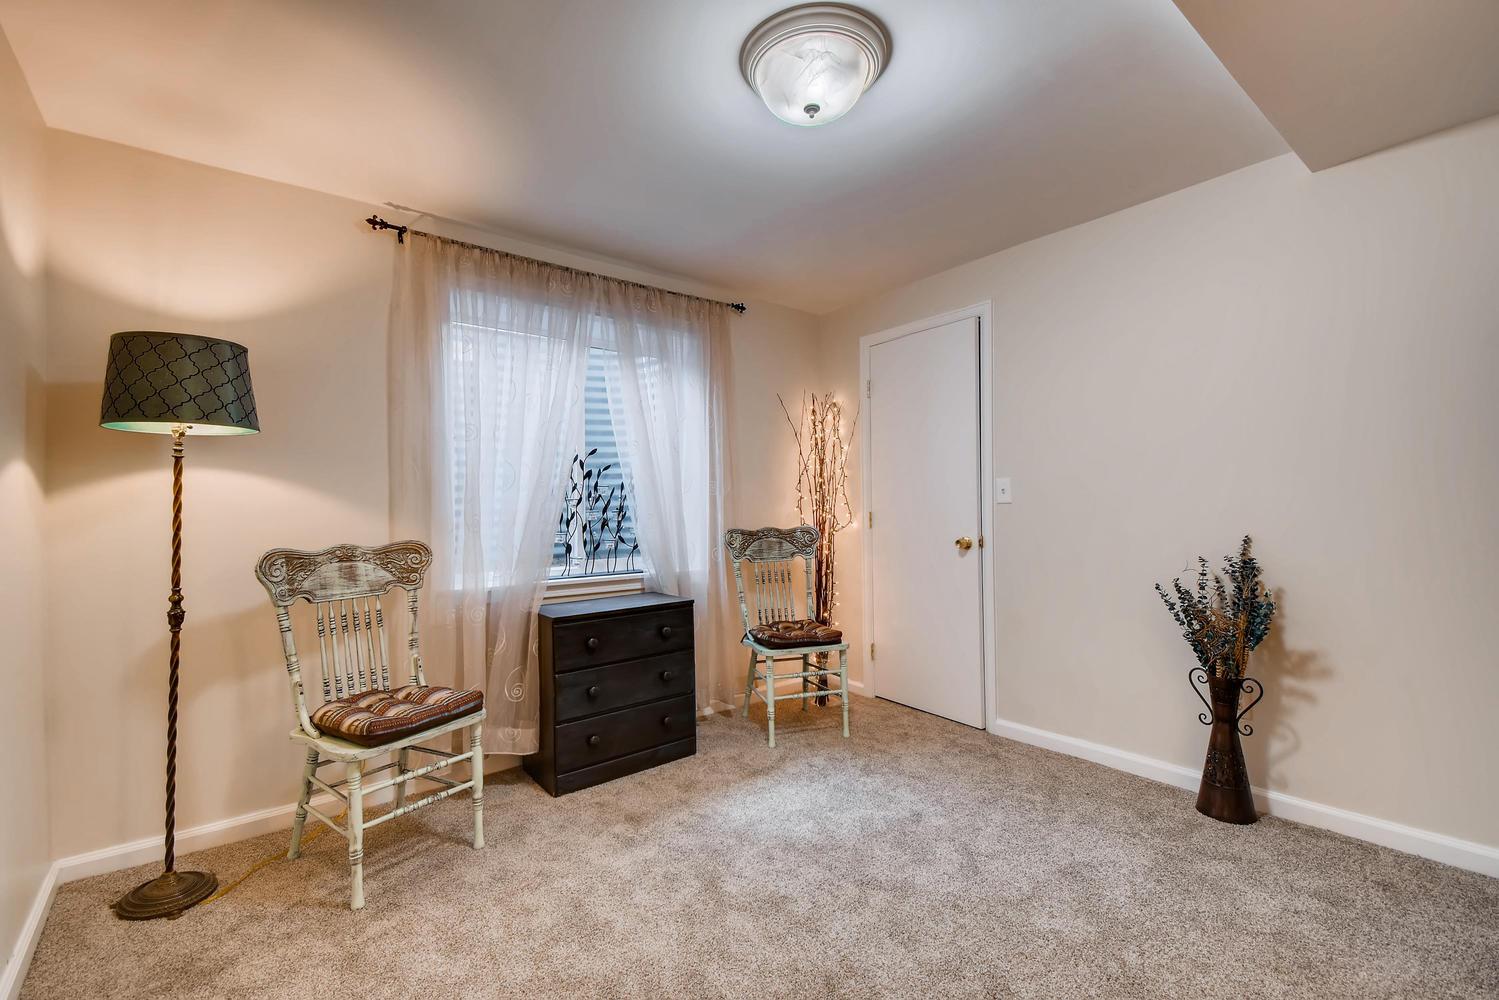 472 Owl Dr Louisville CO 80027-large-018-8-Lower Level Bedroom-1499x1000-72dpi.jpg